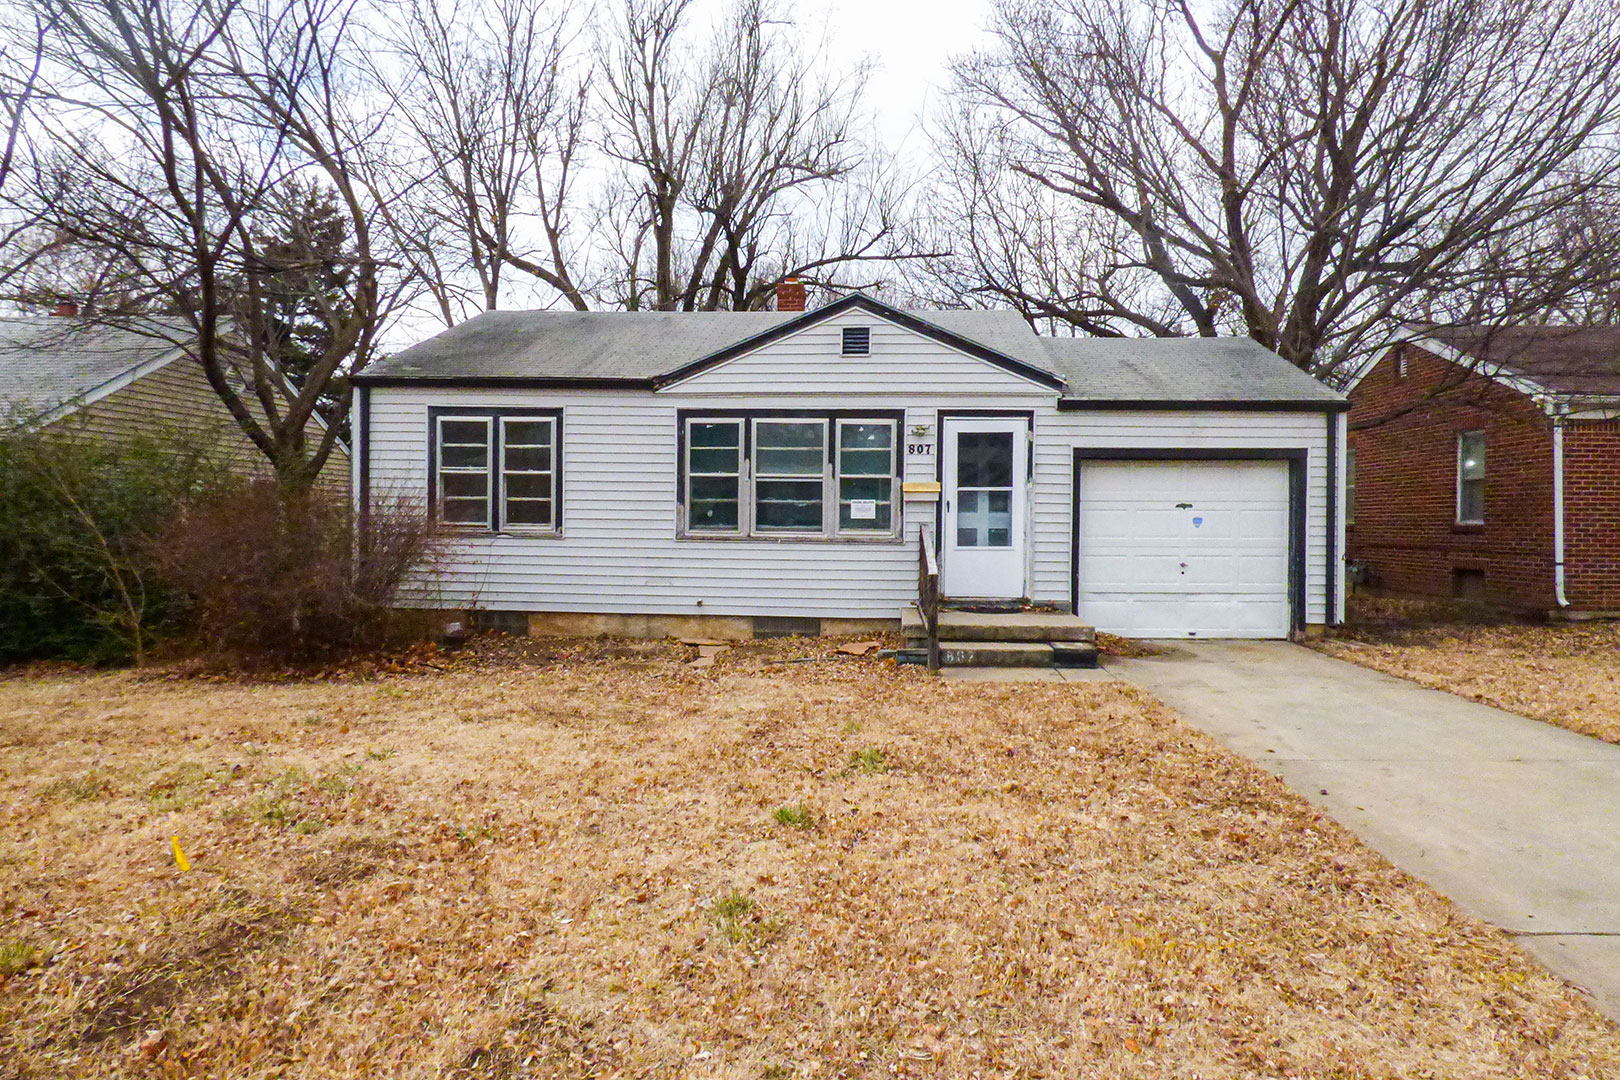 McCurdy Auction - (NE) 2-BR, 1-BA Home w/ BSMT and Attached 1-Car Gar.